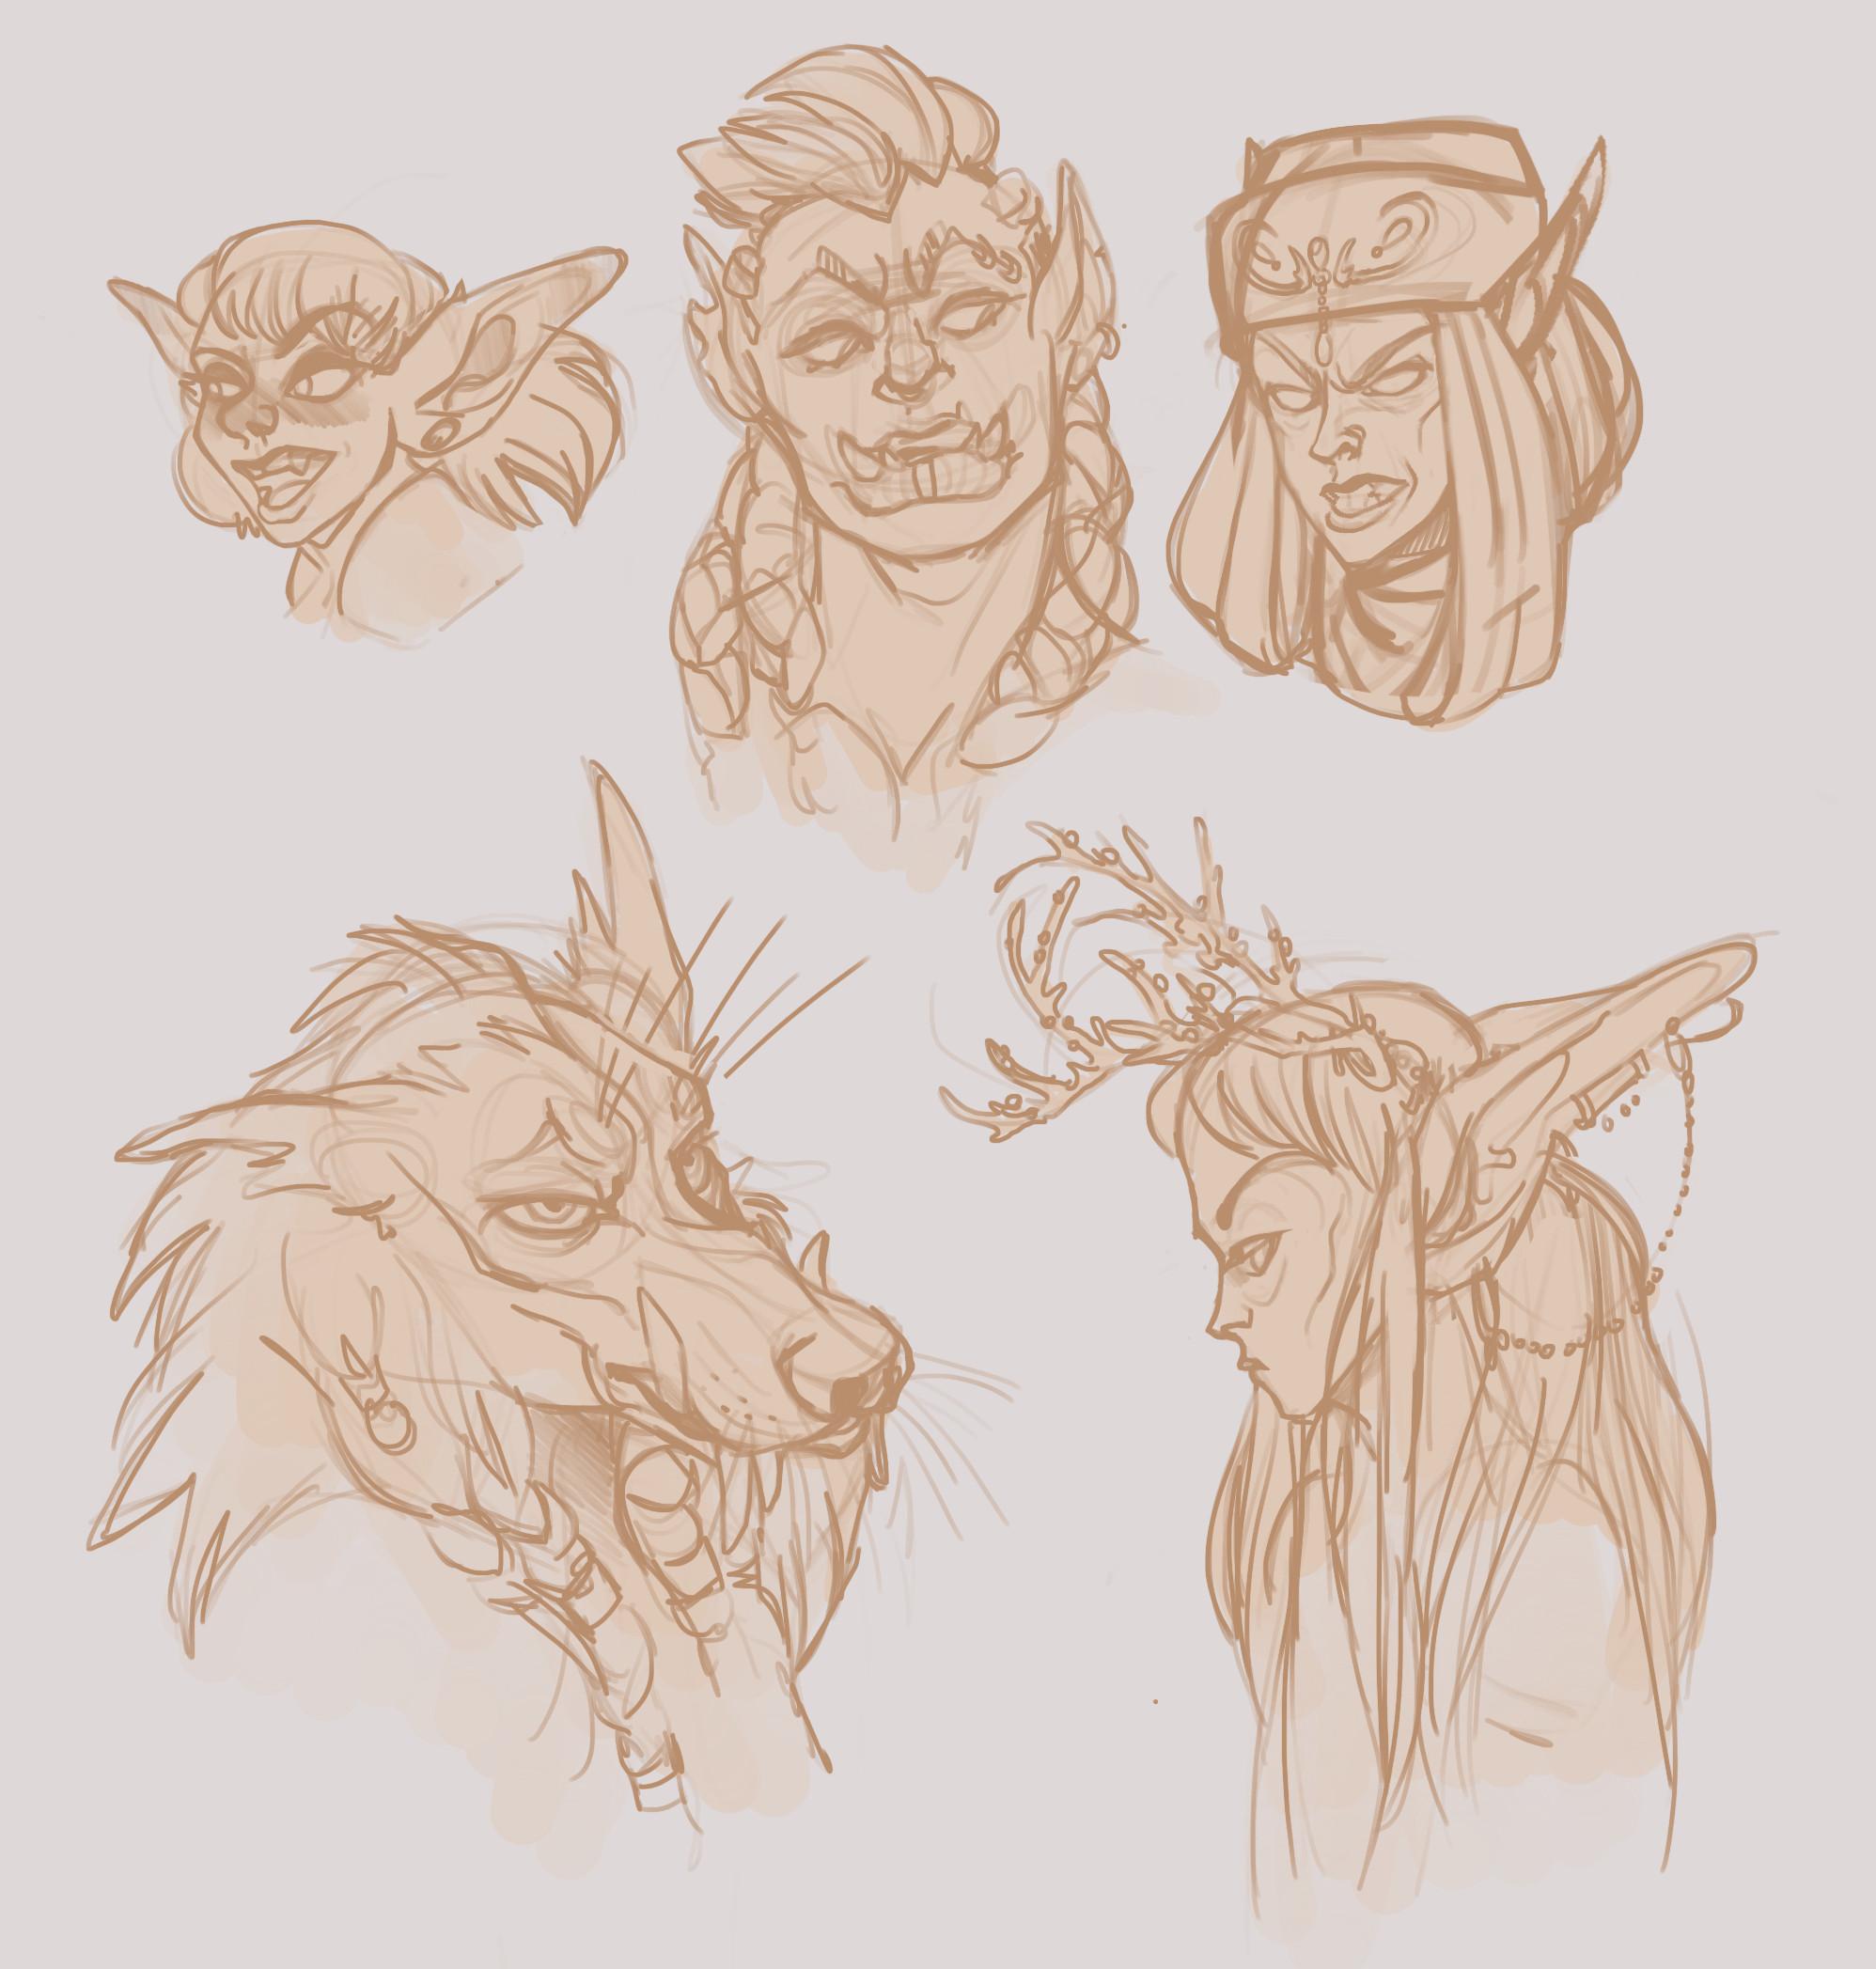 My current WoW mains; Muuscatelle (arcane mage), Csillag (arcane mage :o), Cymbelline (void elf... something), Lohengrimm (arms warrior), and Fionnuala (holy priest)